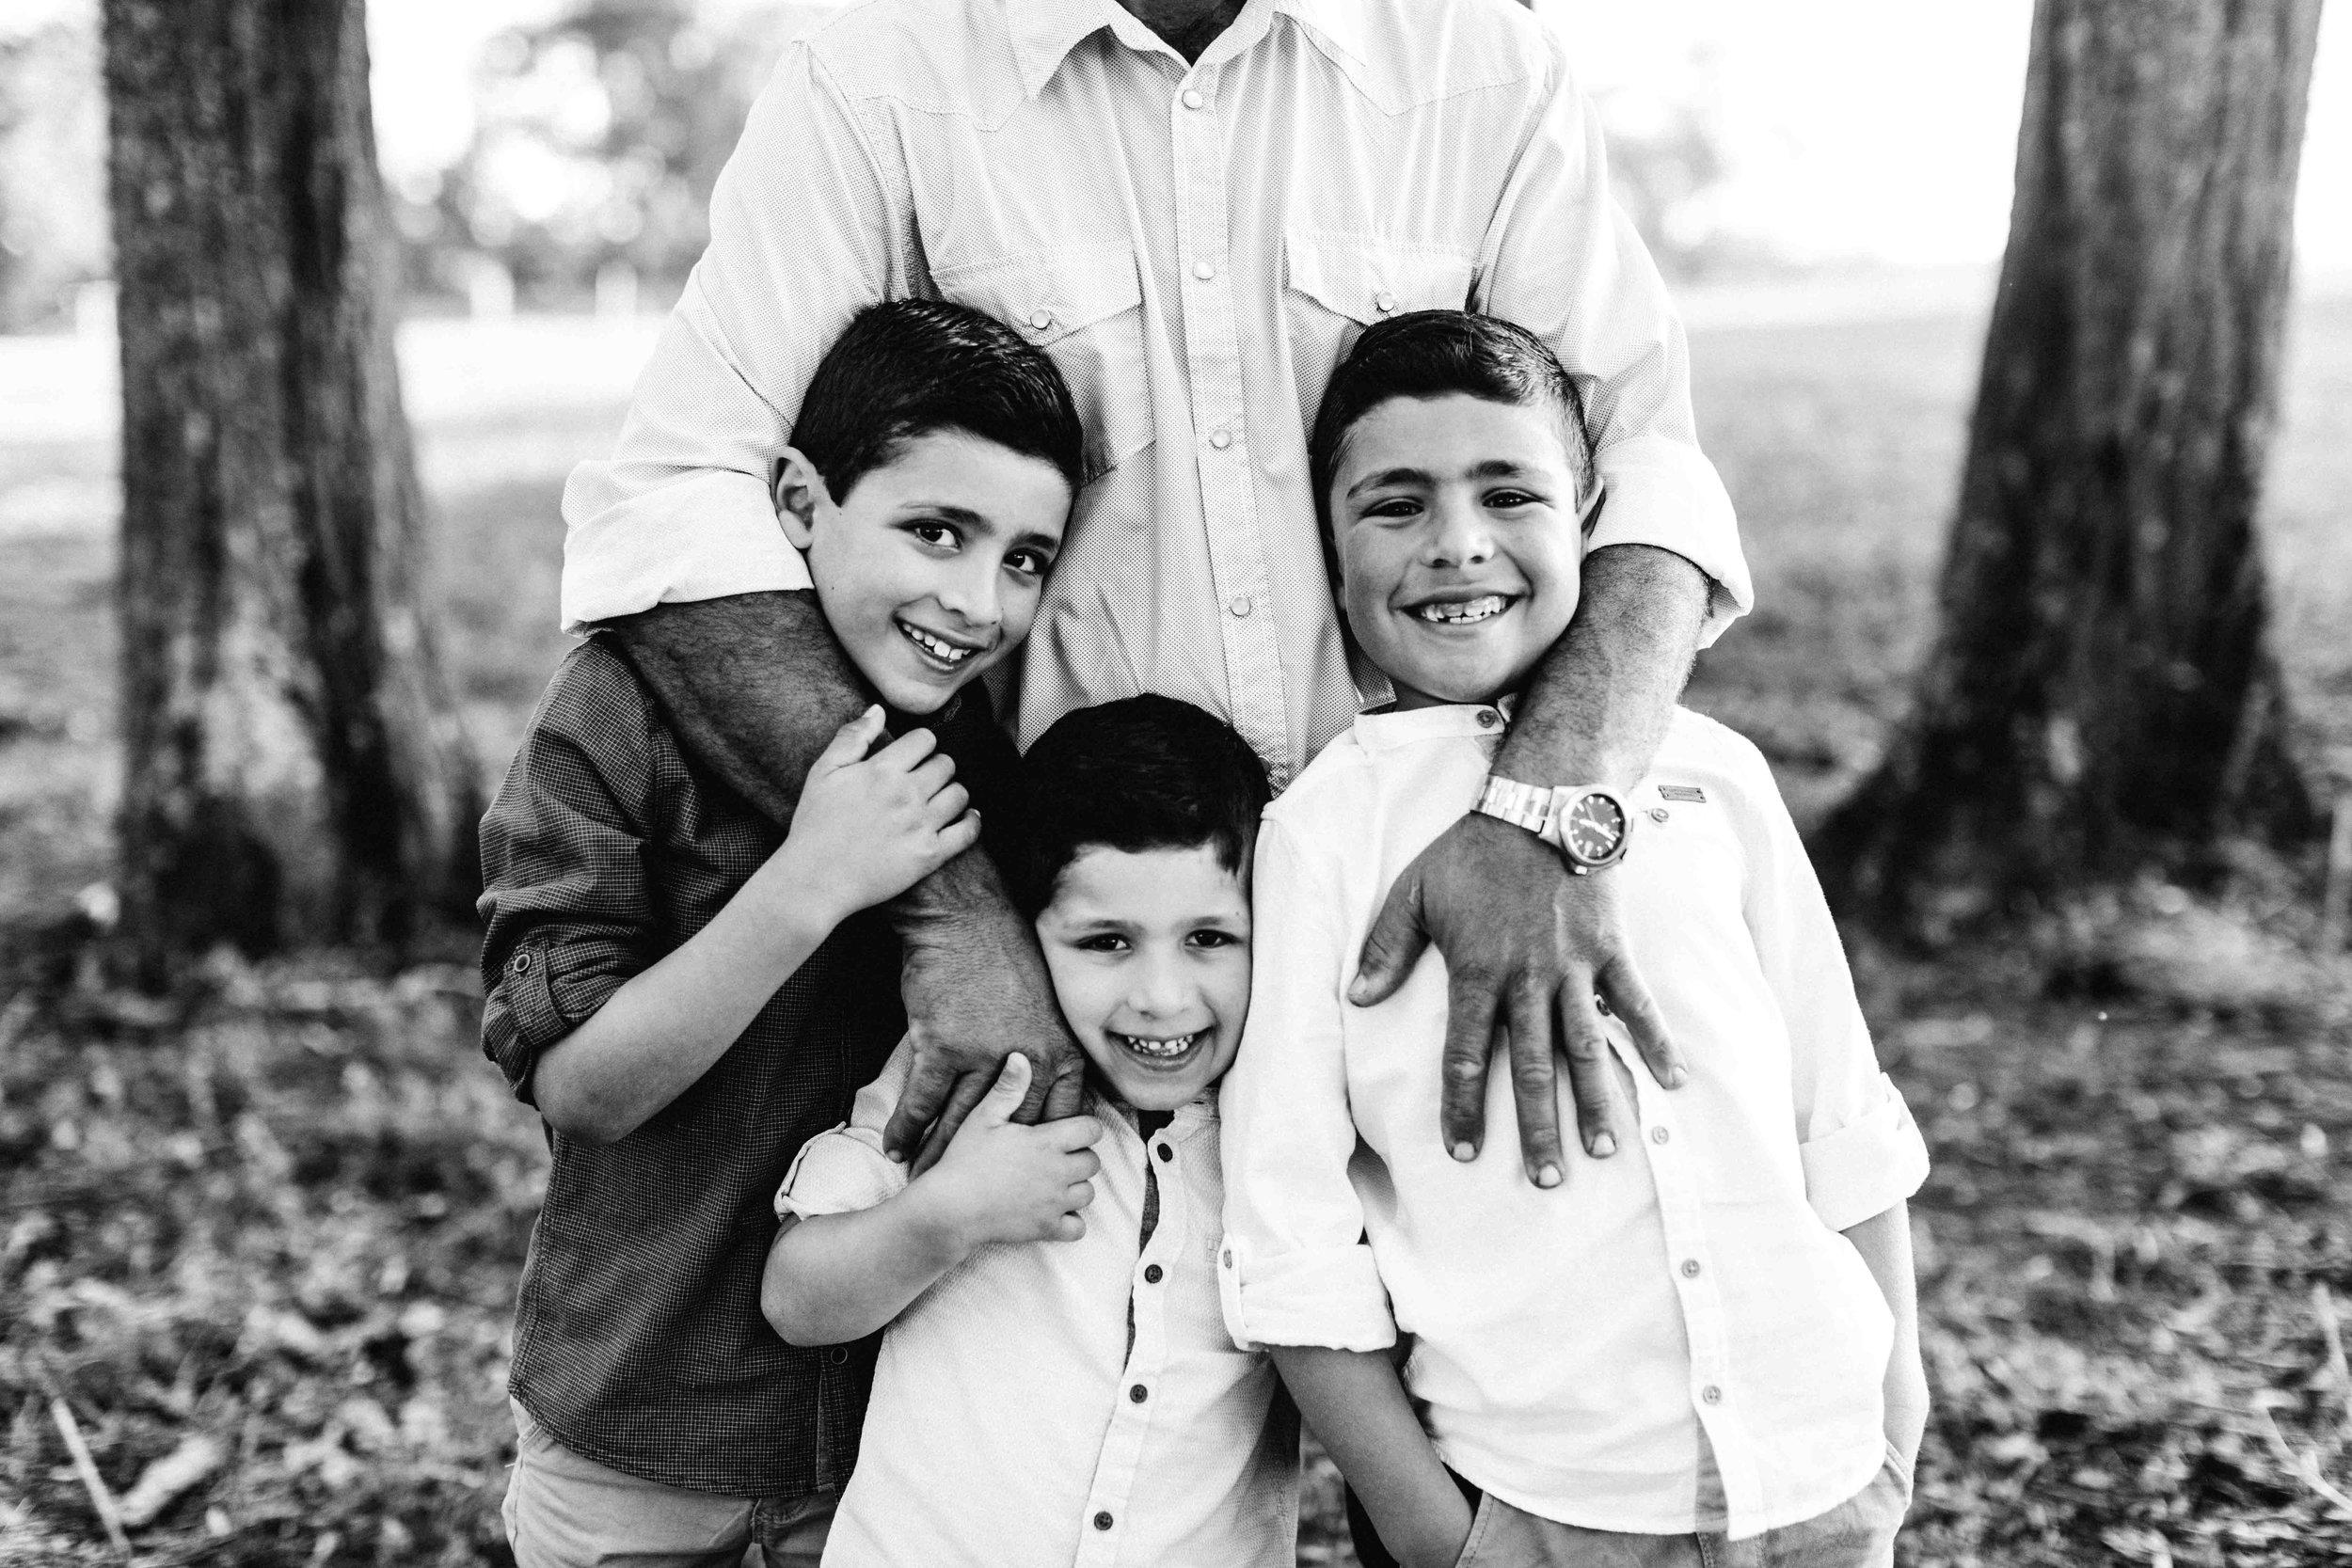 camden-family-photography-galea-www.emilyobrienphotography.net-11.jpg